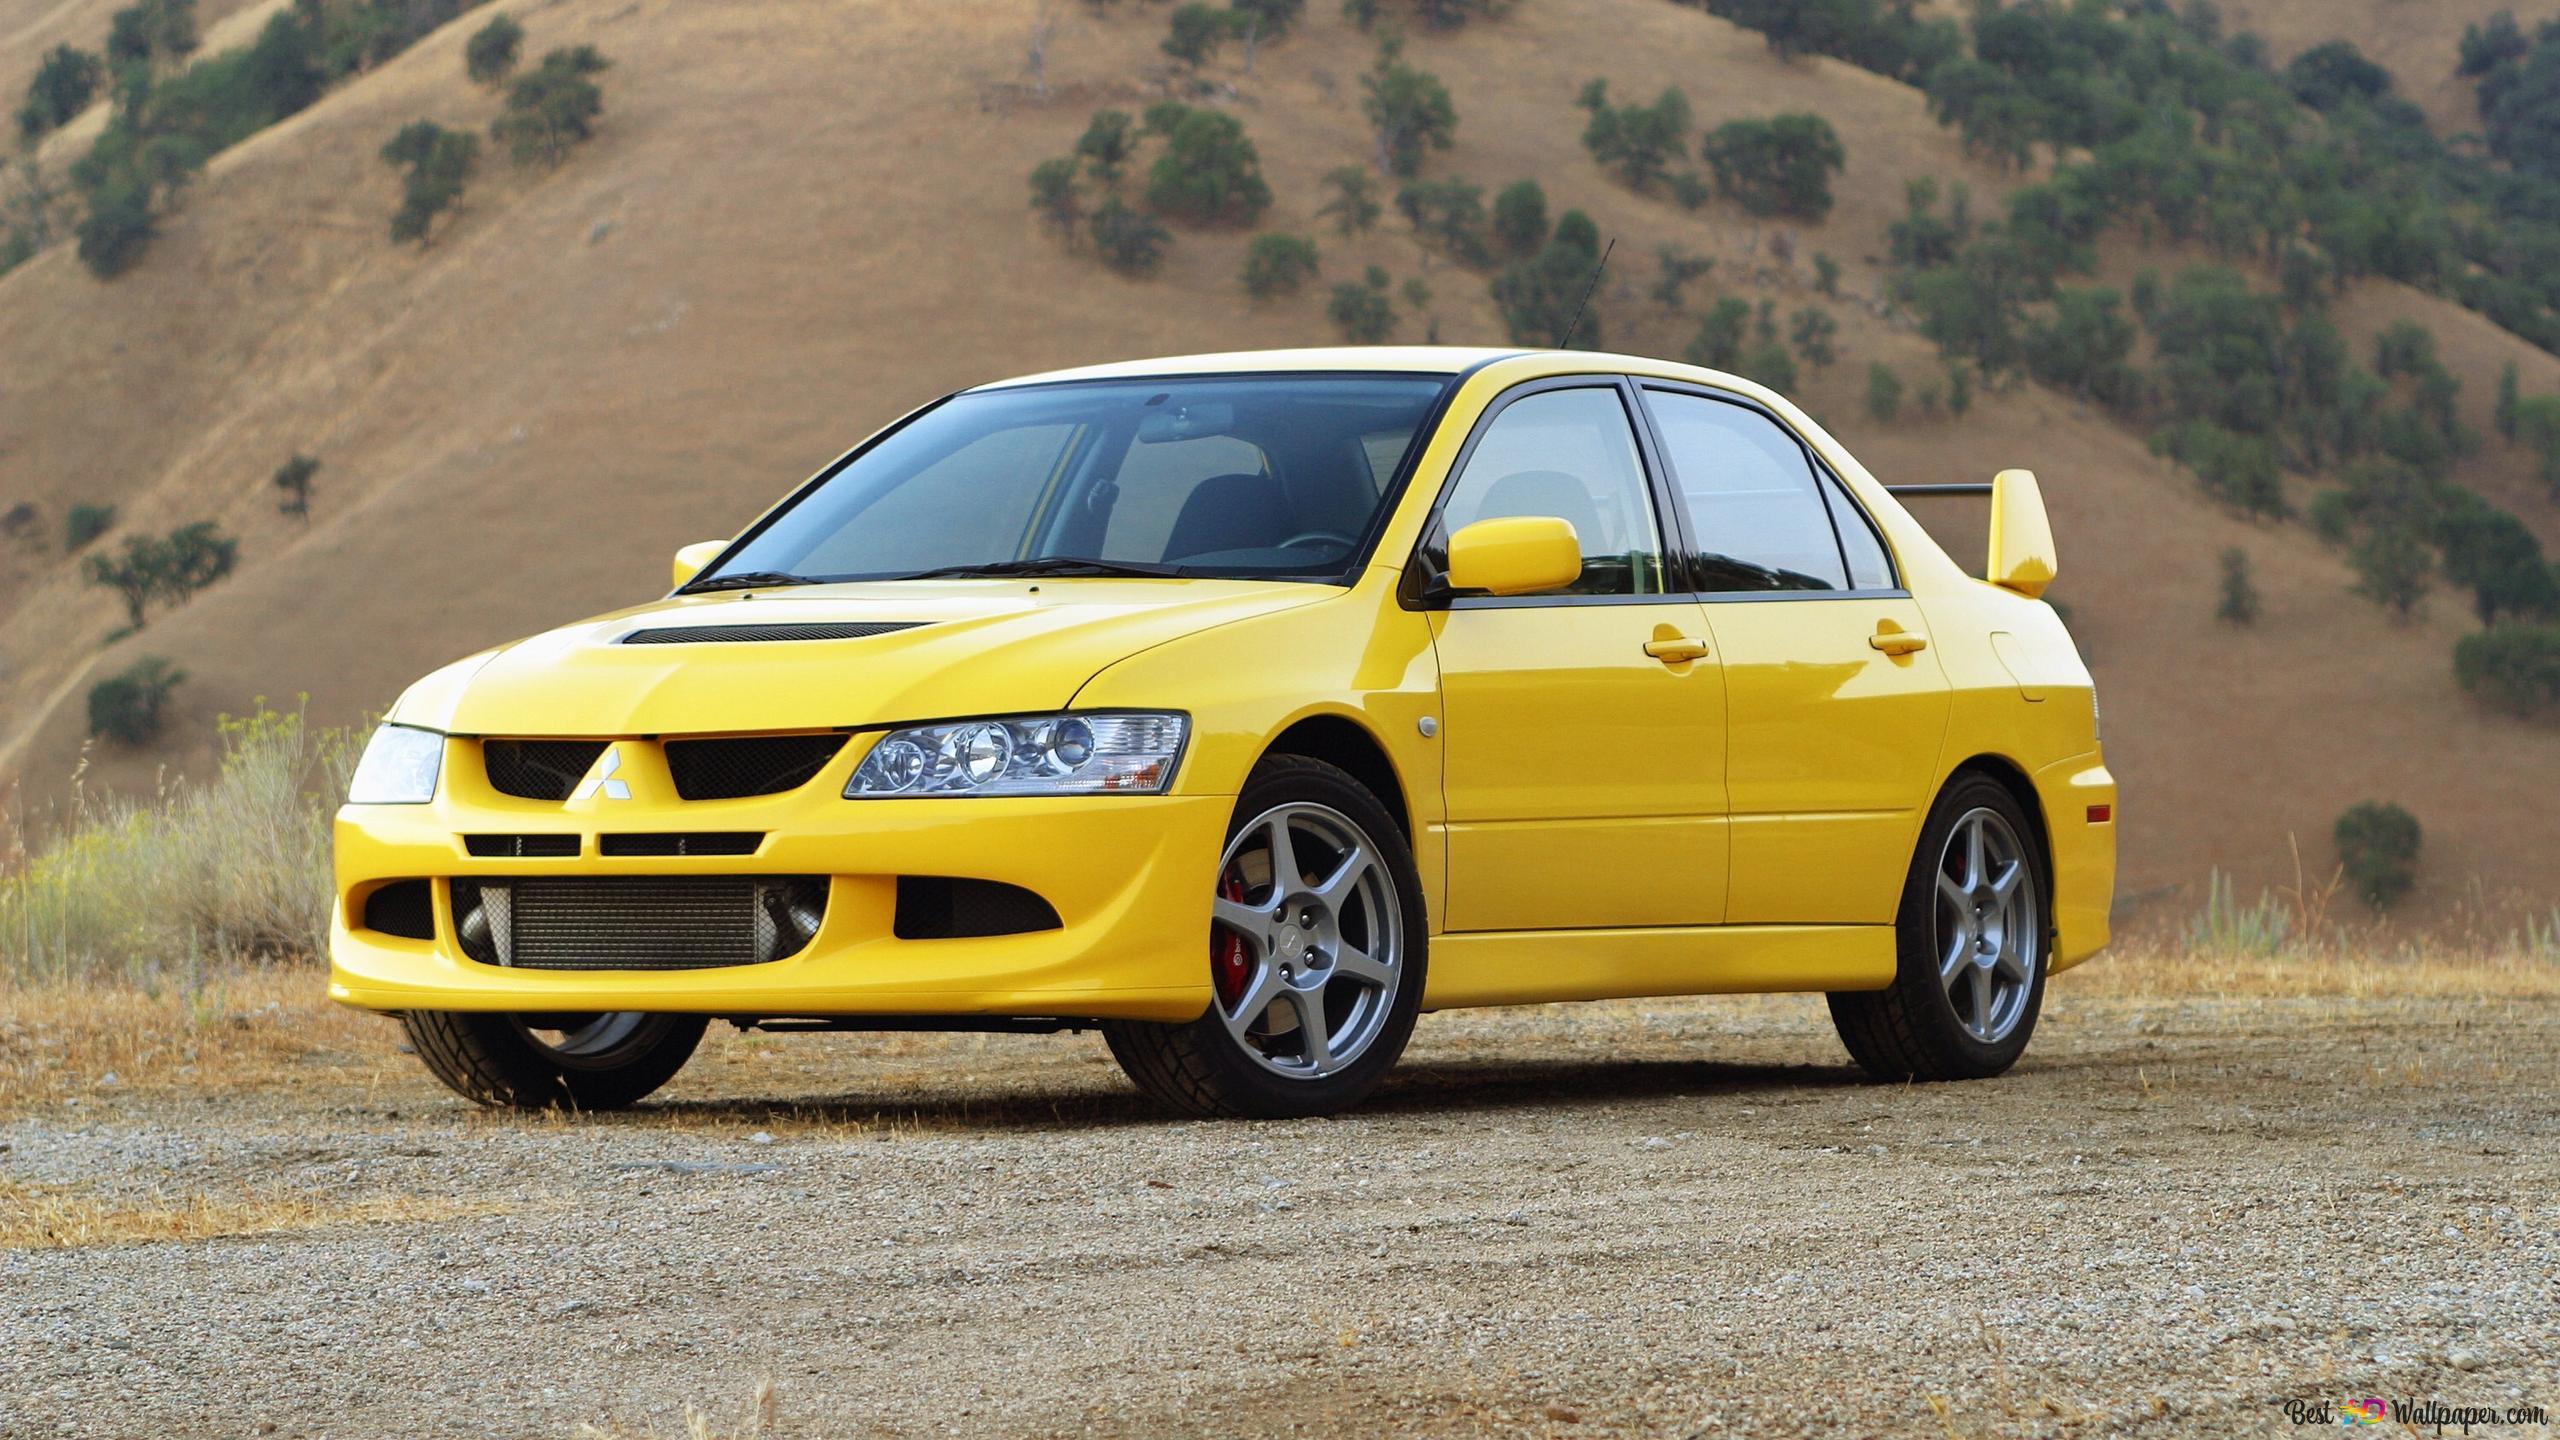 Yellow Mitsubishi Lancer Evolution Sport Car Hd Wallpaper Download